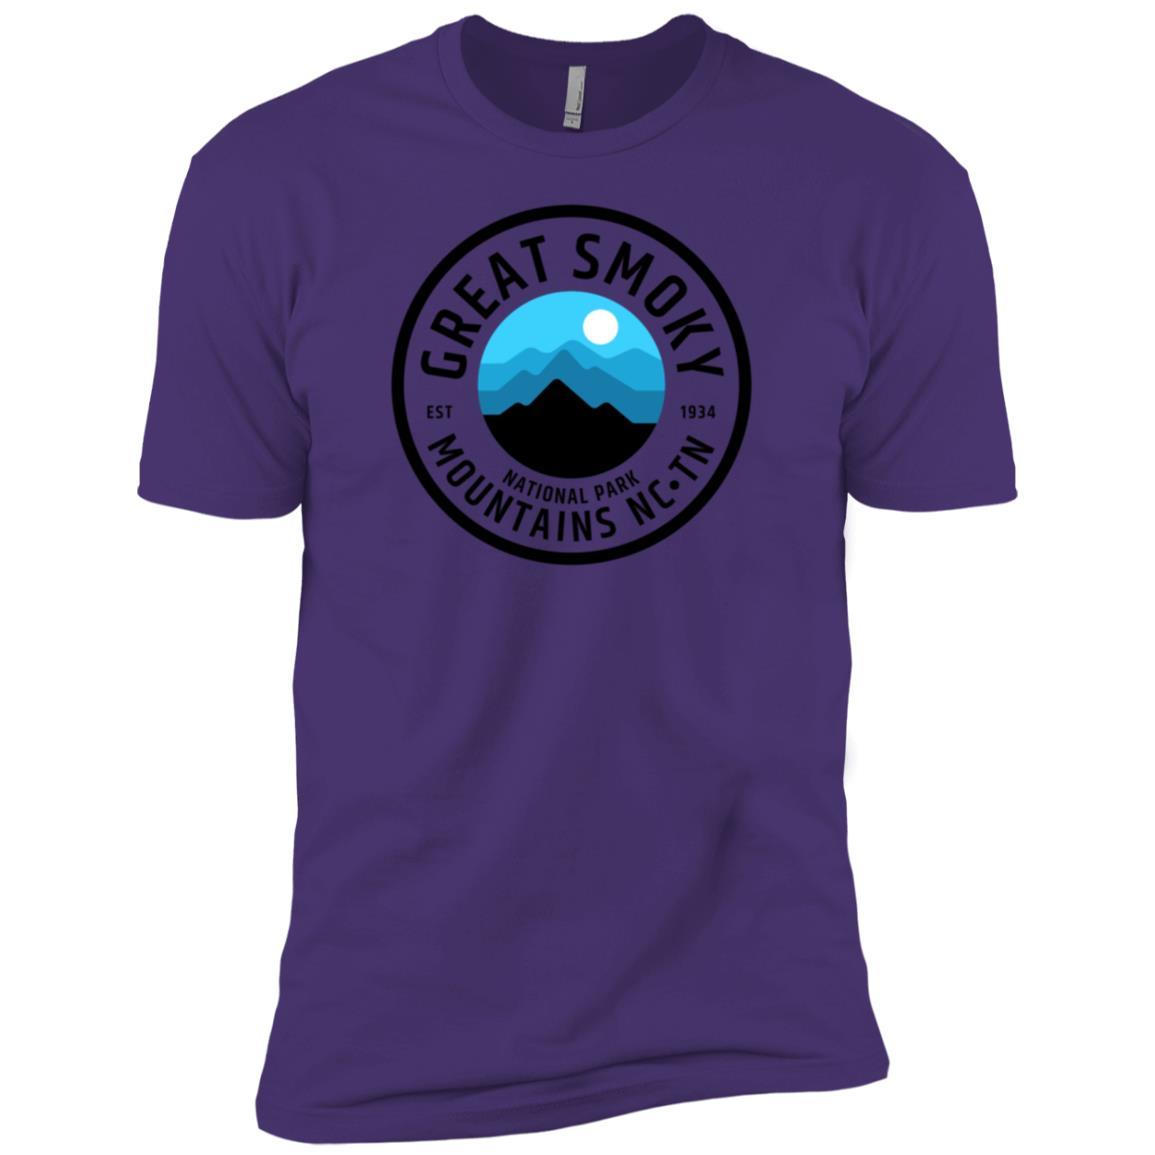 Great Smoky Mountains Men Short Sleeve T-Shirt